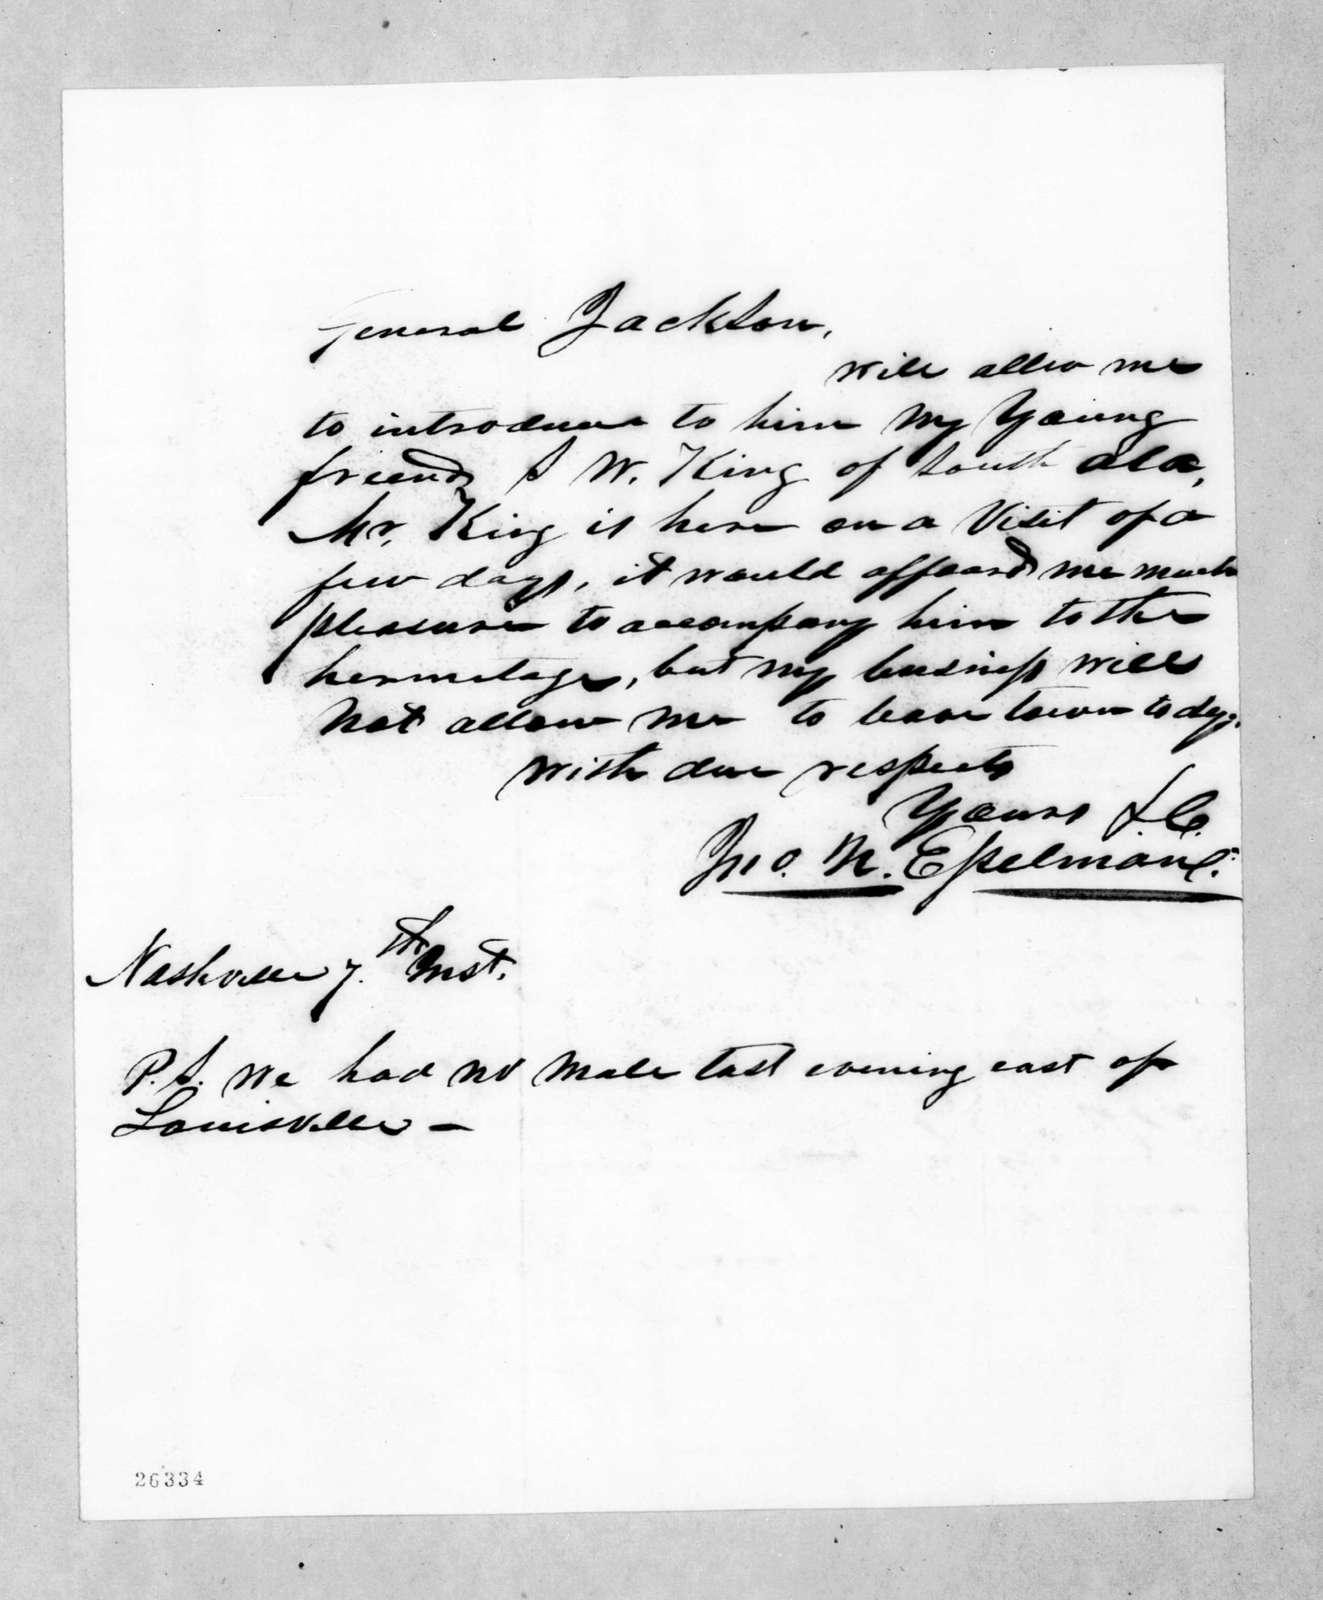 Joseph N. Esselman to Andrew Jackson